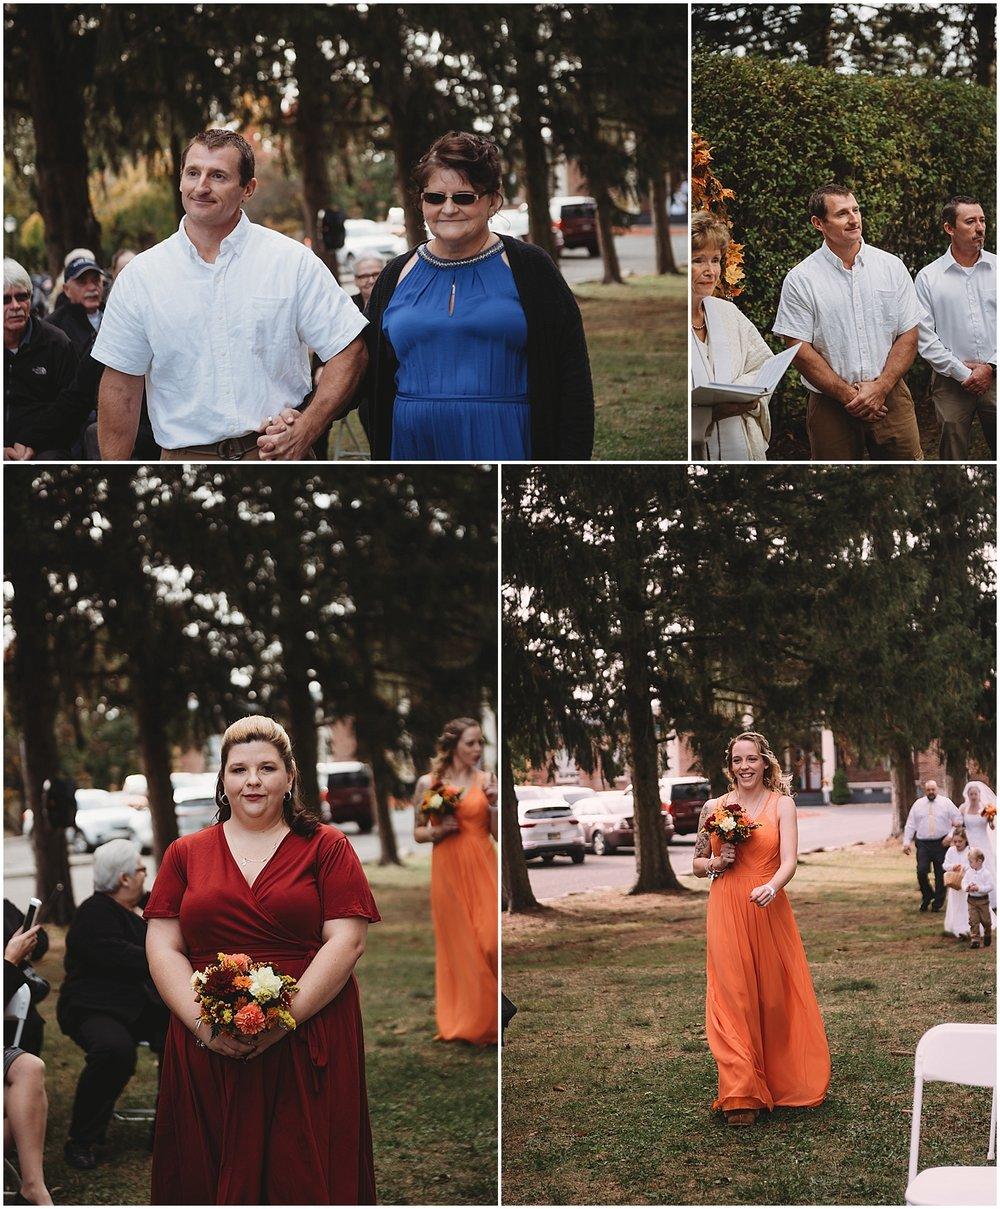 NEPA-Scranton-Dallas-wedding-engagement-photographer-in-Philadelphia-PA-Central-PA_0082.jpg